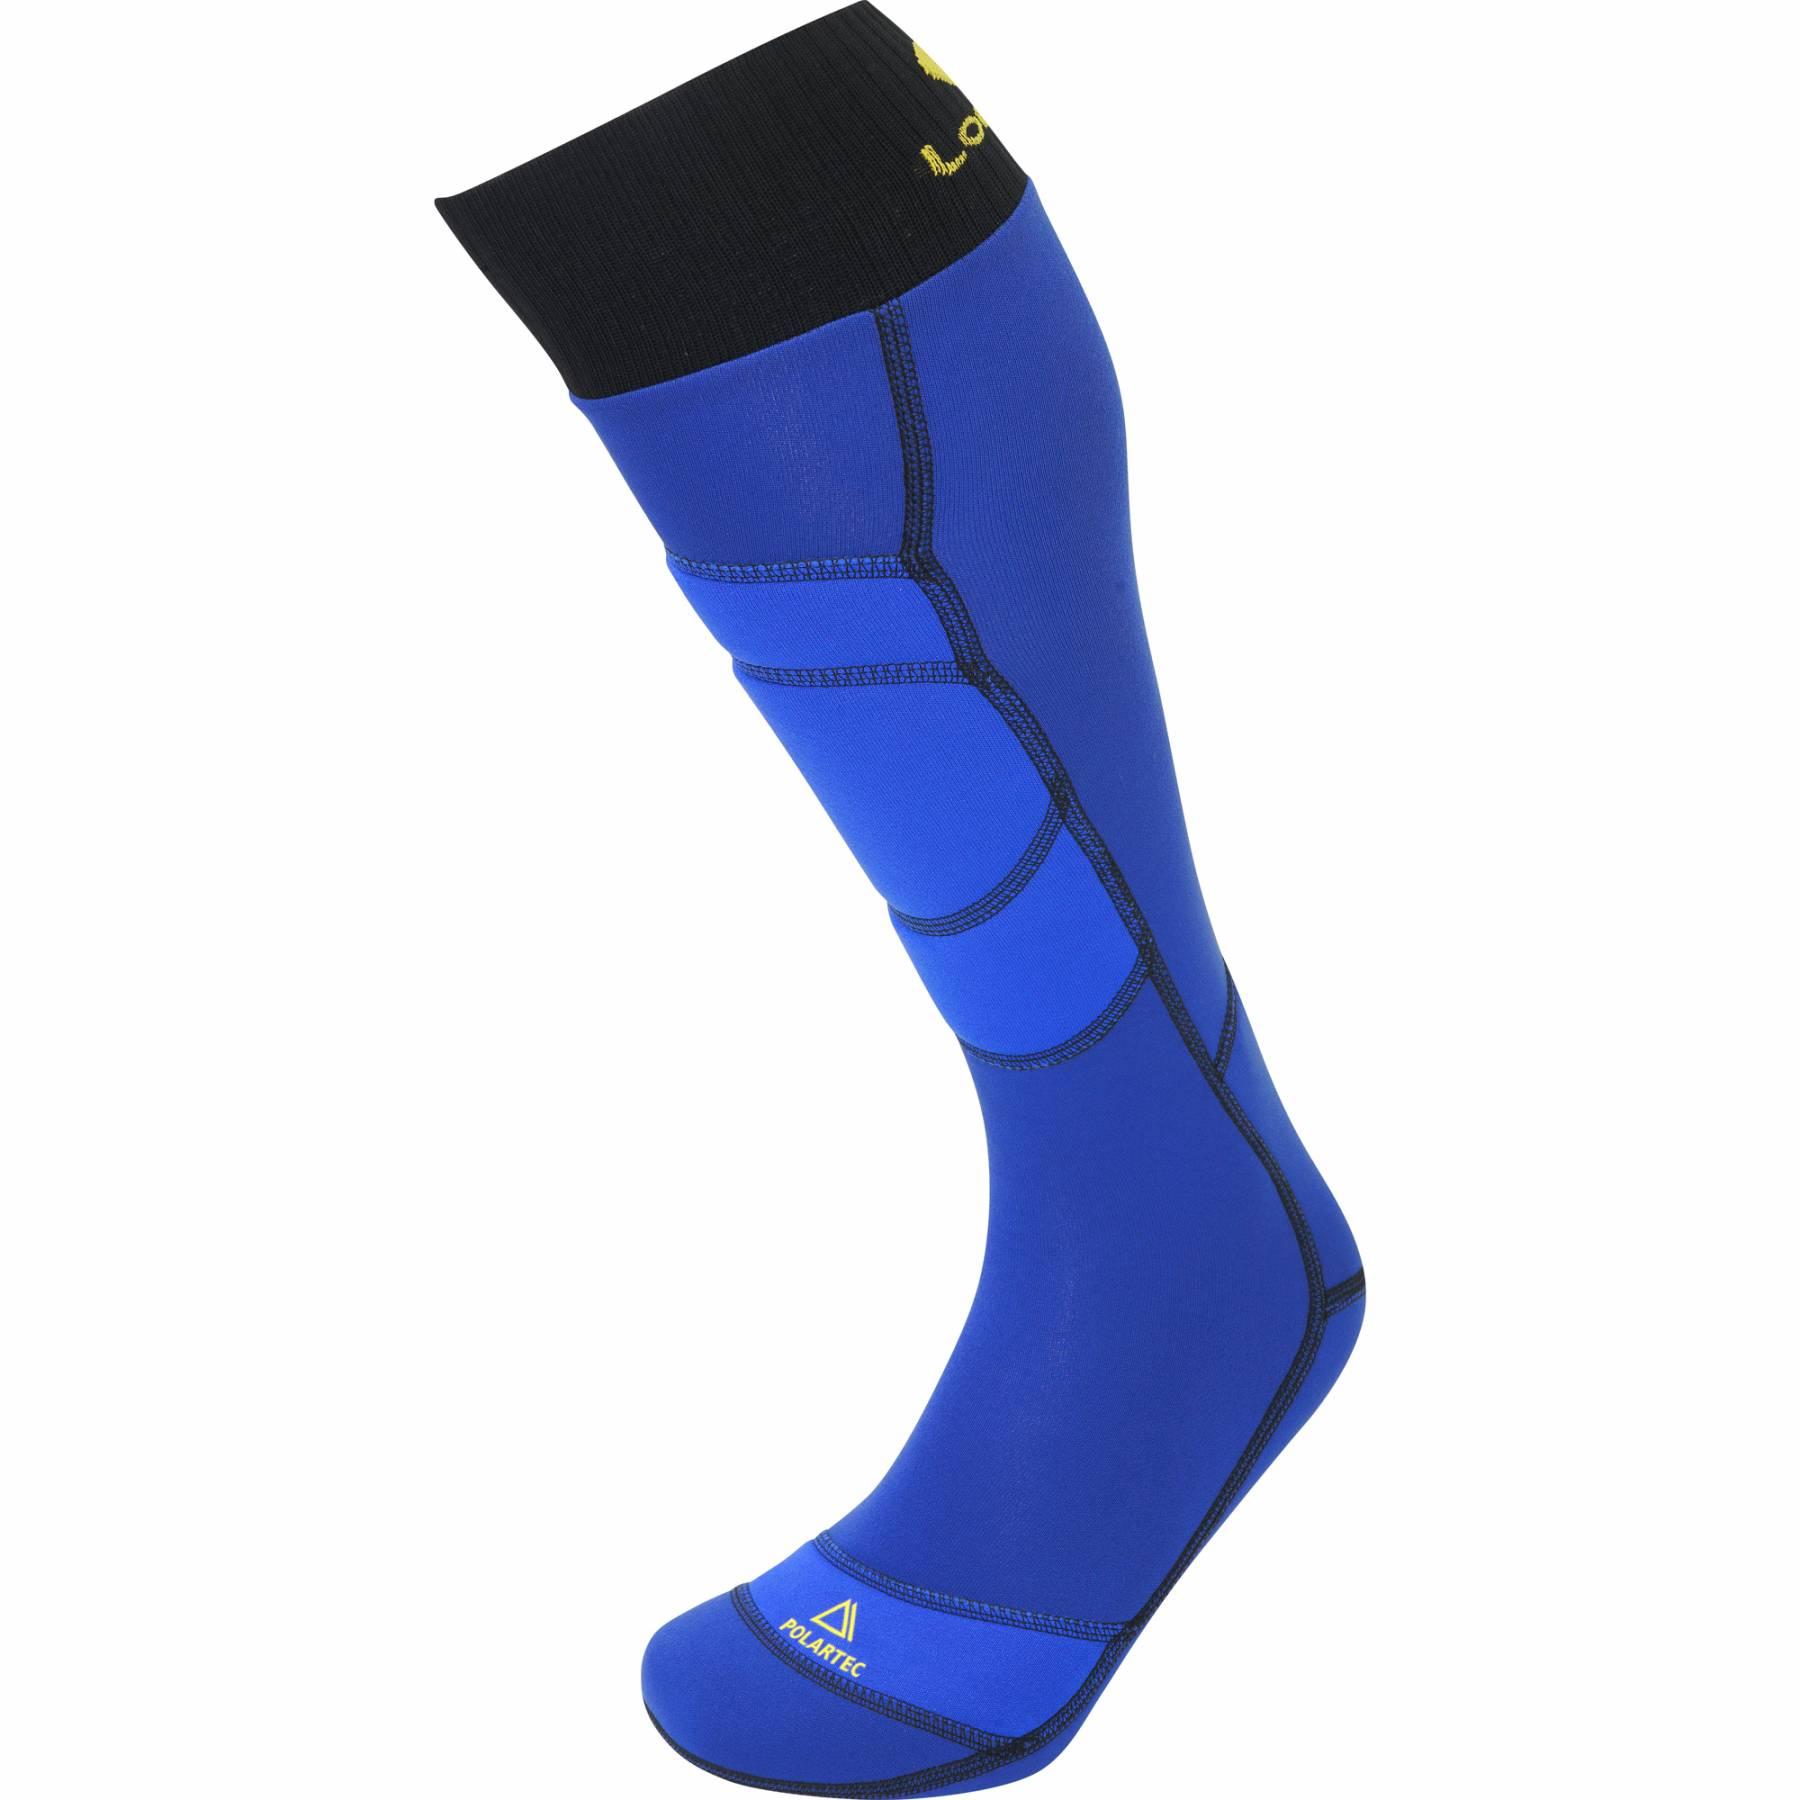 4f2832a35 Emerging Gear: Polartec Alpha Socks | 2018-09-27 | GearJunkie